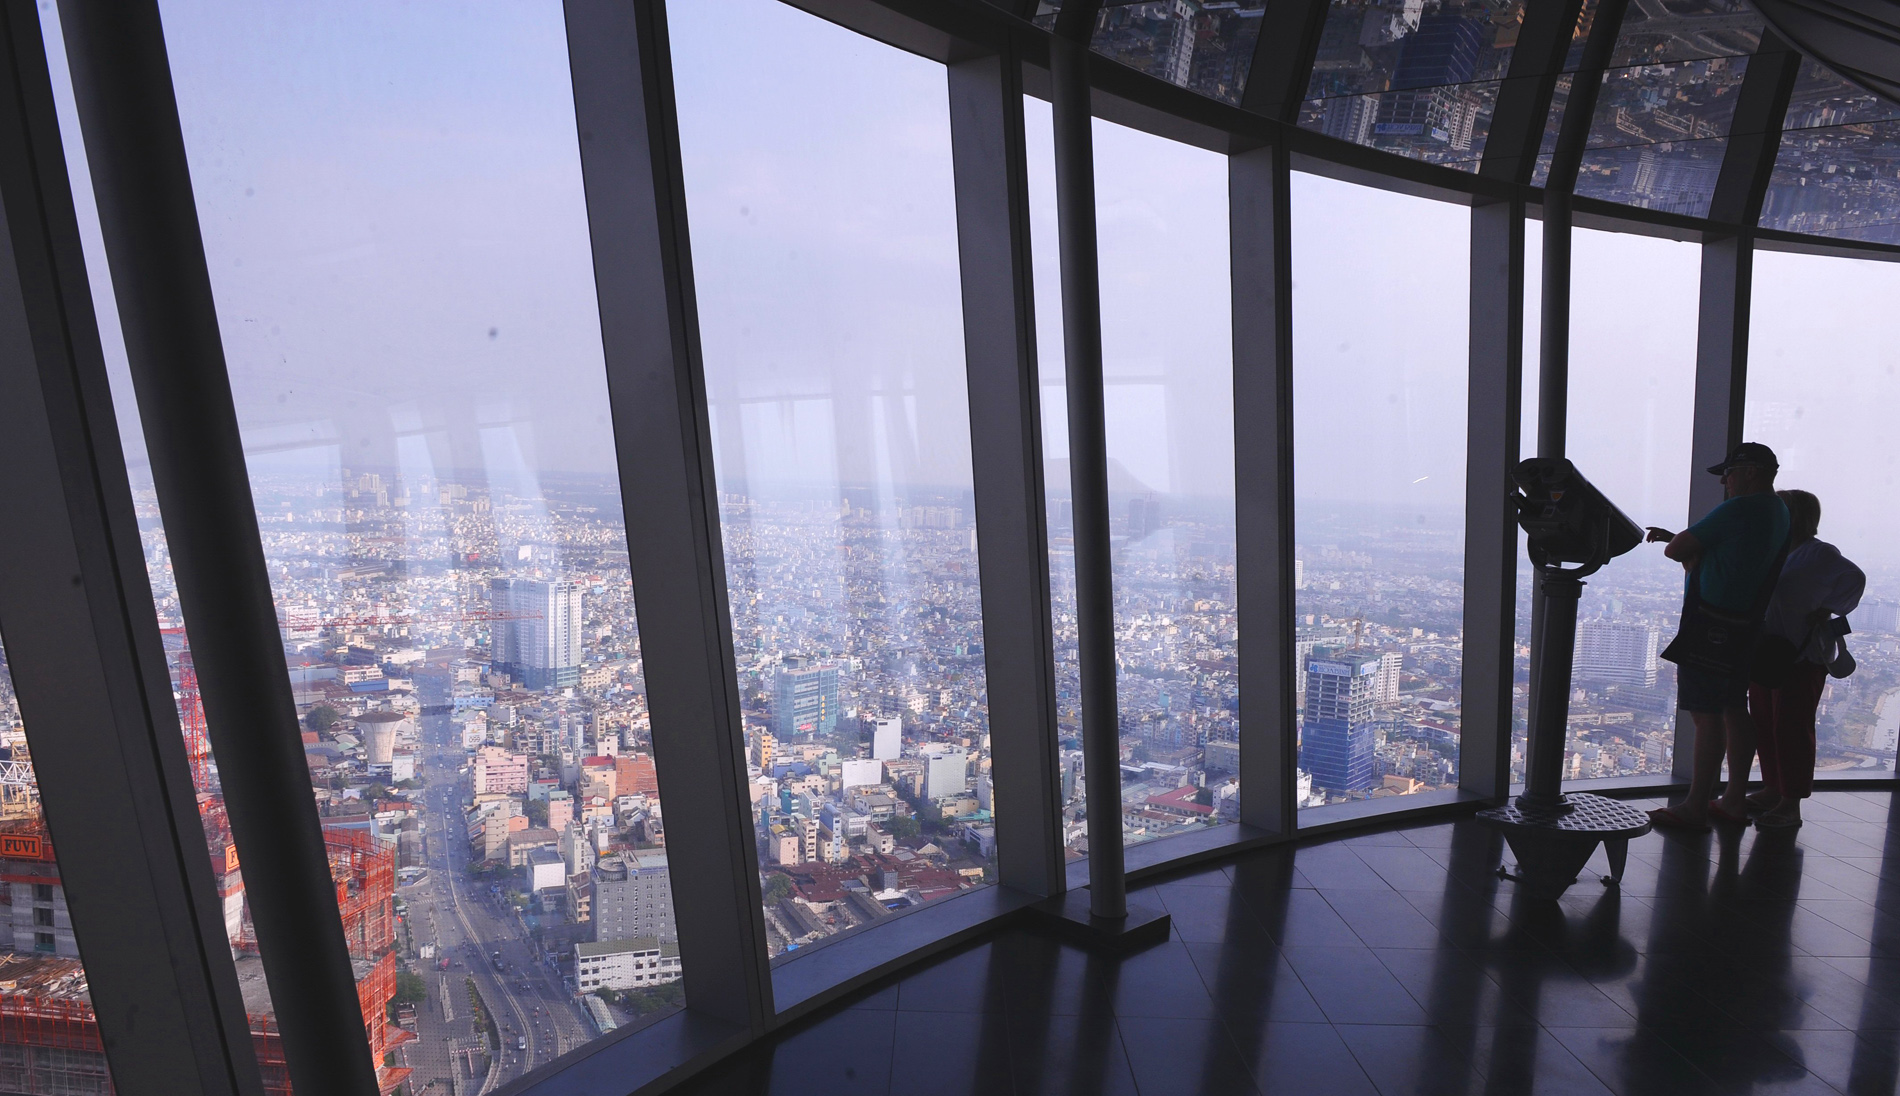 visiting ho chi minh city insiders share tips cnn travel